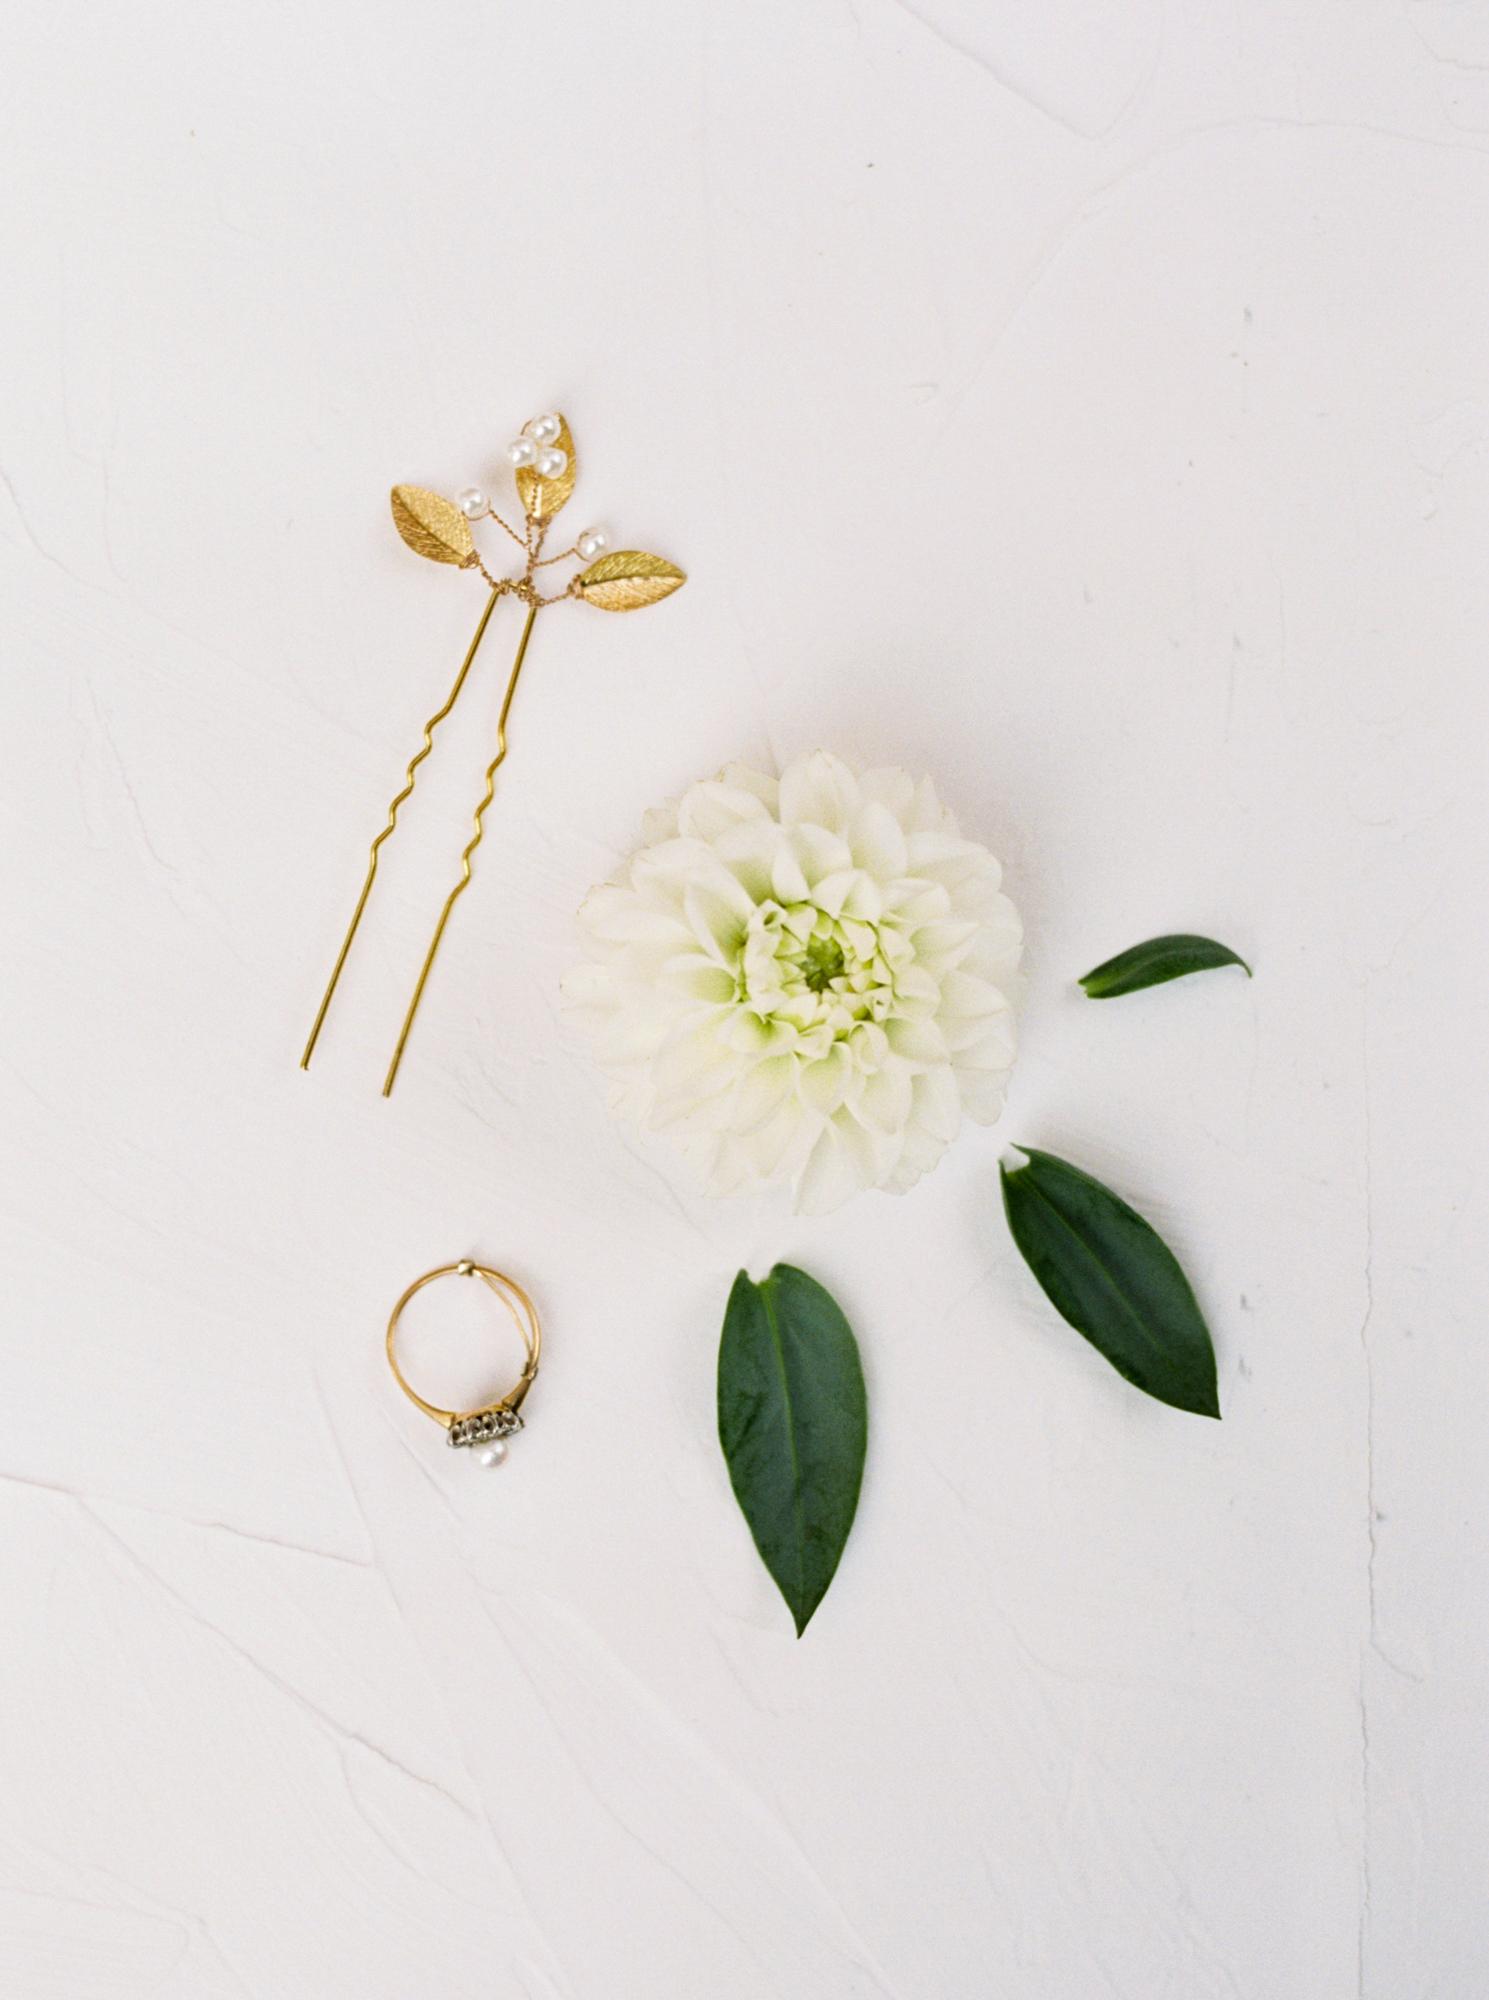 haley-richter-photography-maas-building-summer-wedding-philadelphia-DIY-birchtree-008.jpg